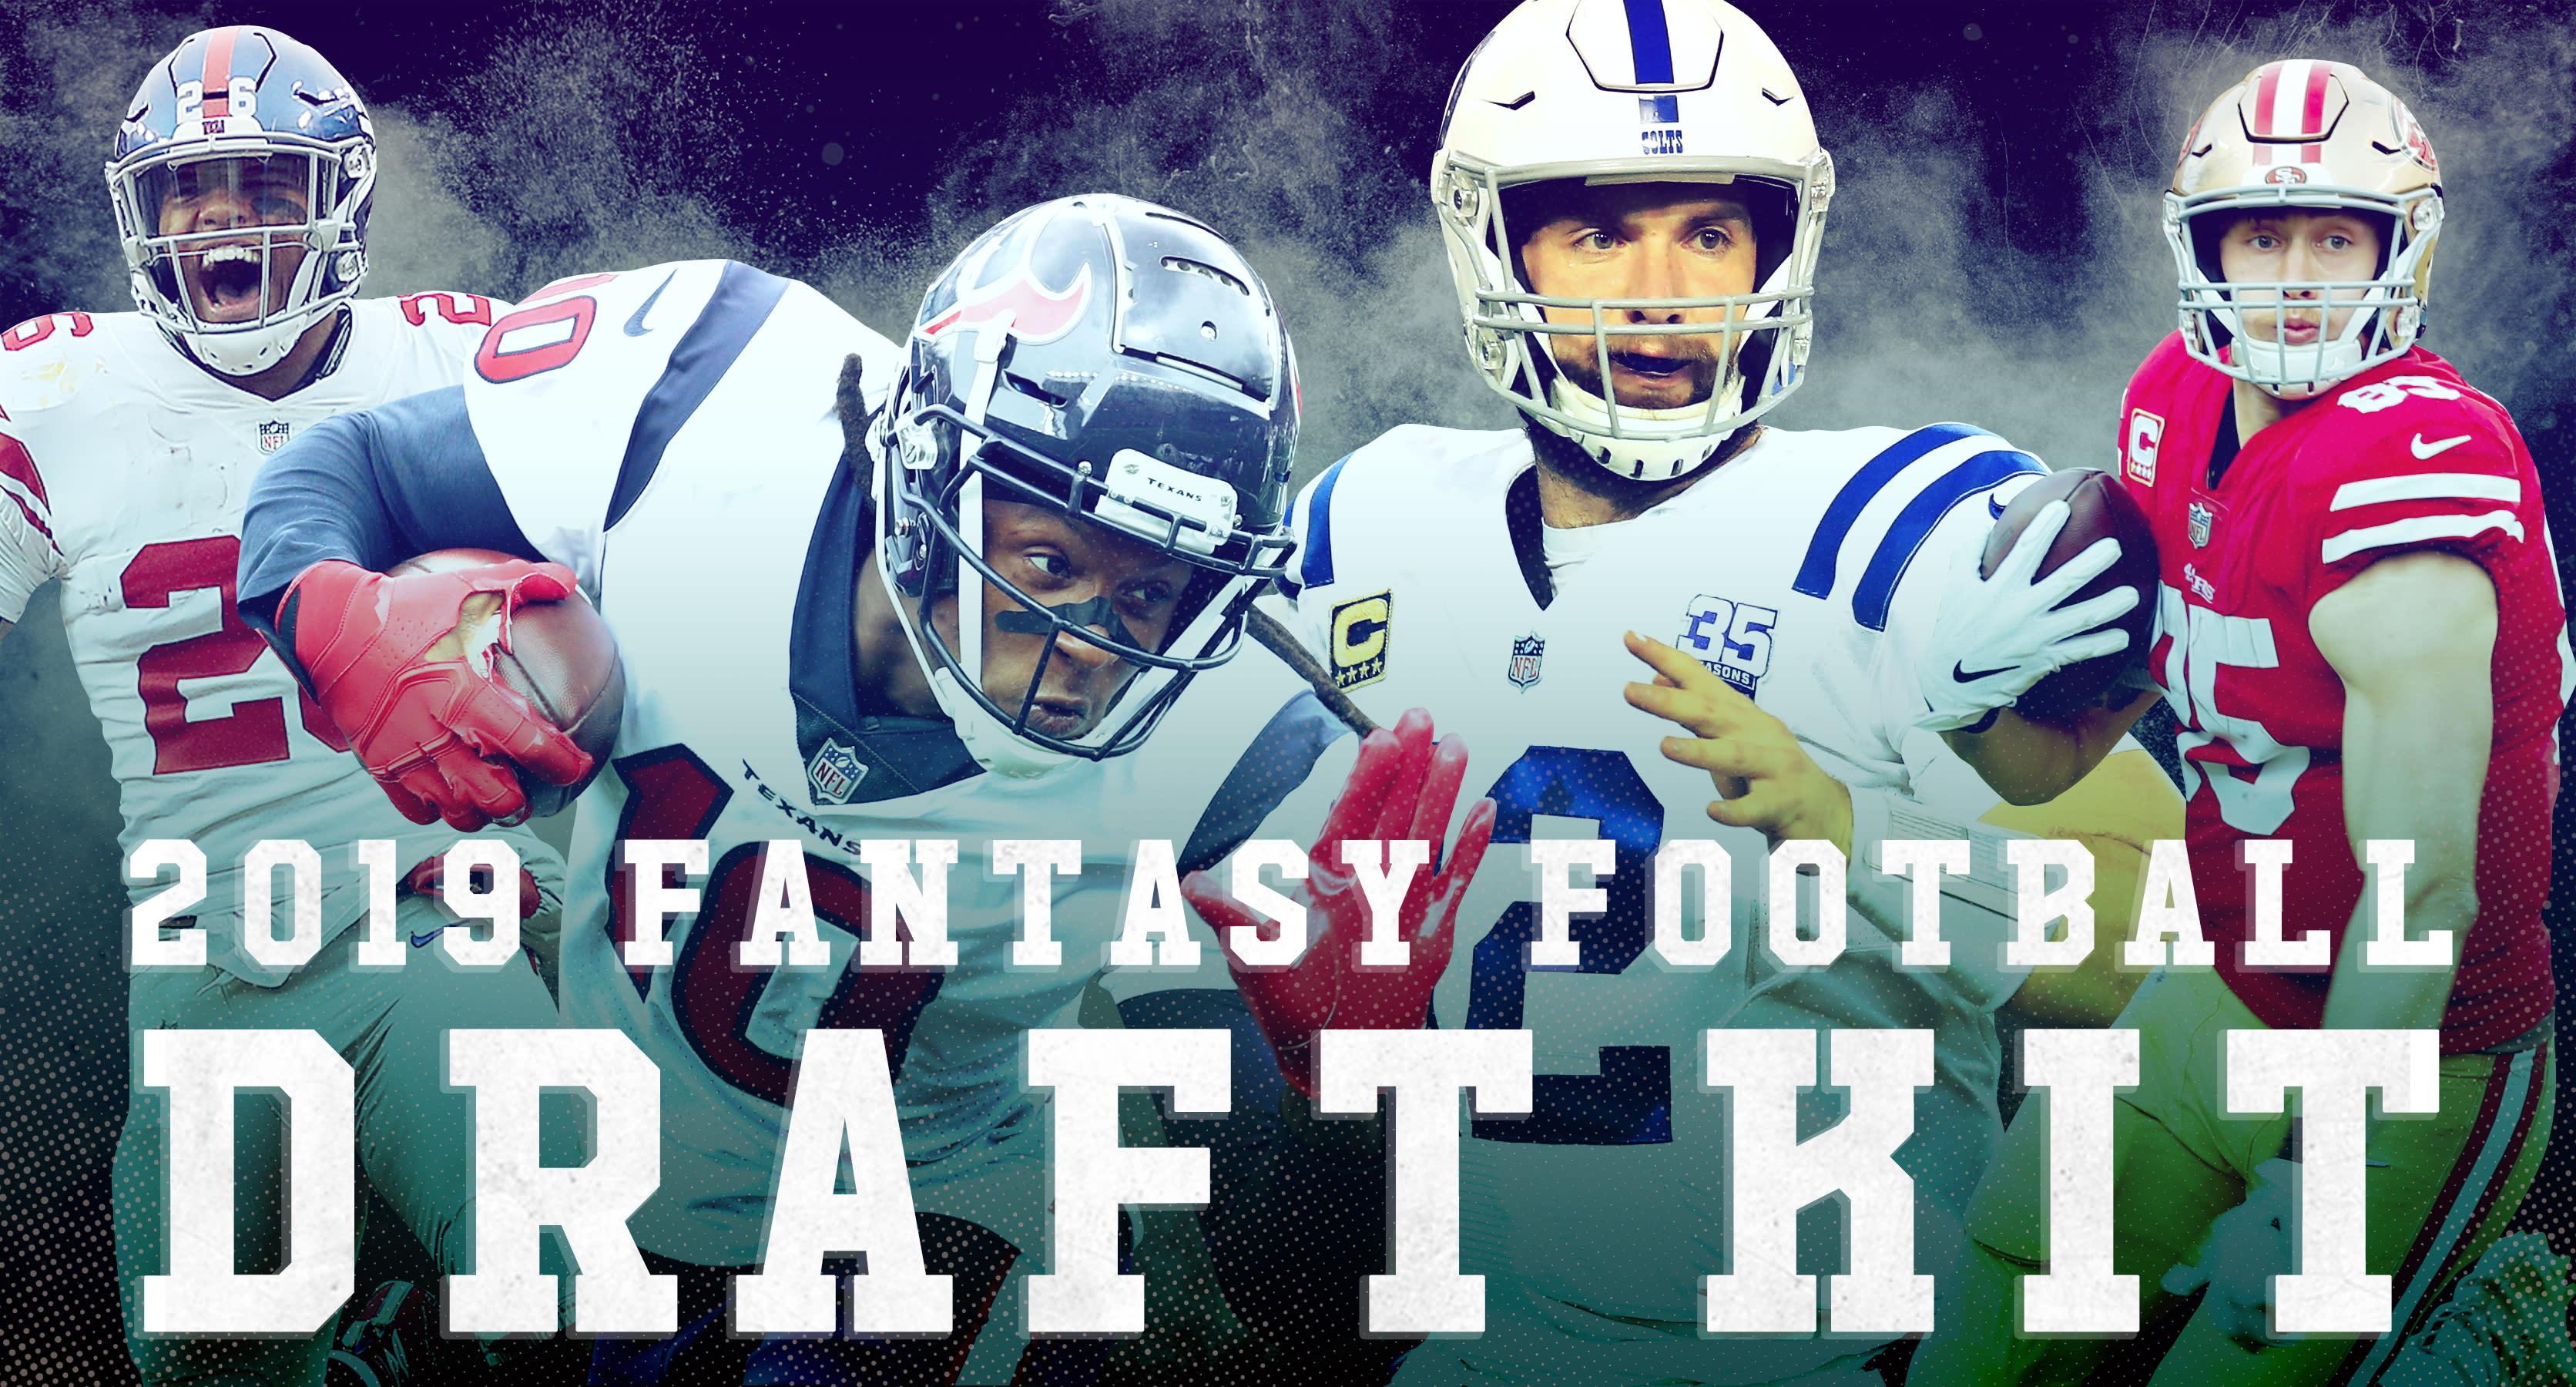 Fantasy Football Draft Kit: 2019 rankings, sleepers and